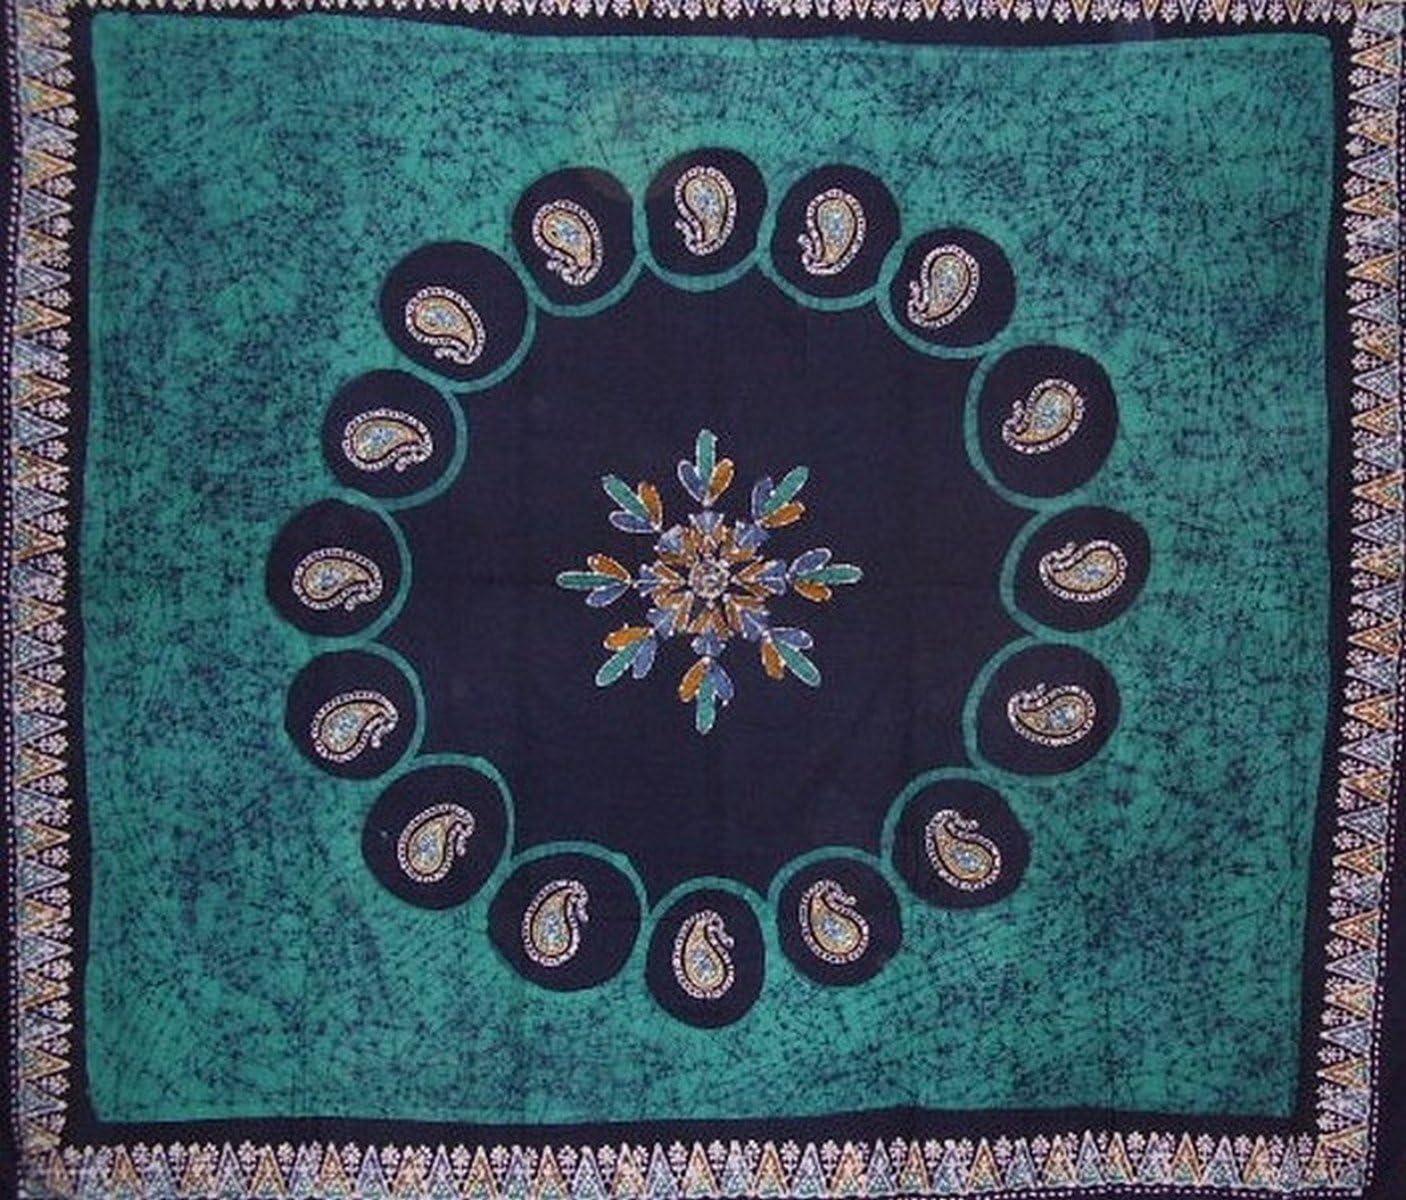 Batik Tapestry Cotton Bedspread 108 x 108 Queen-King Green